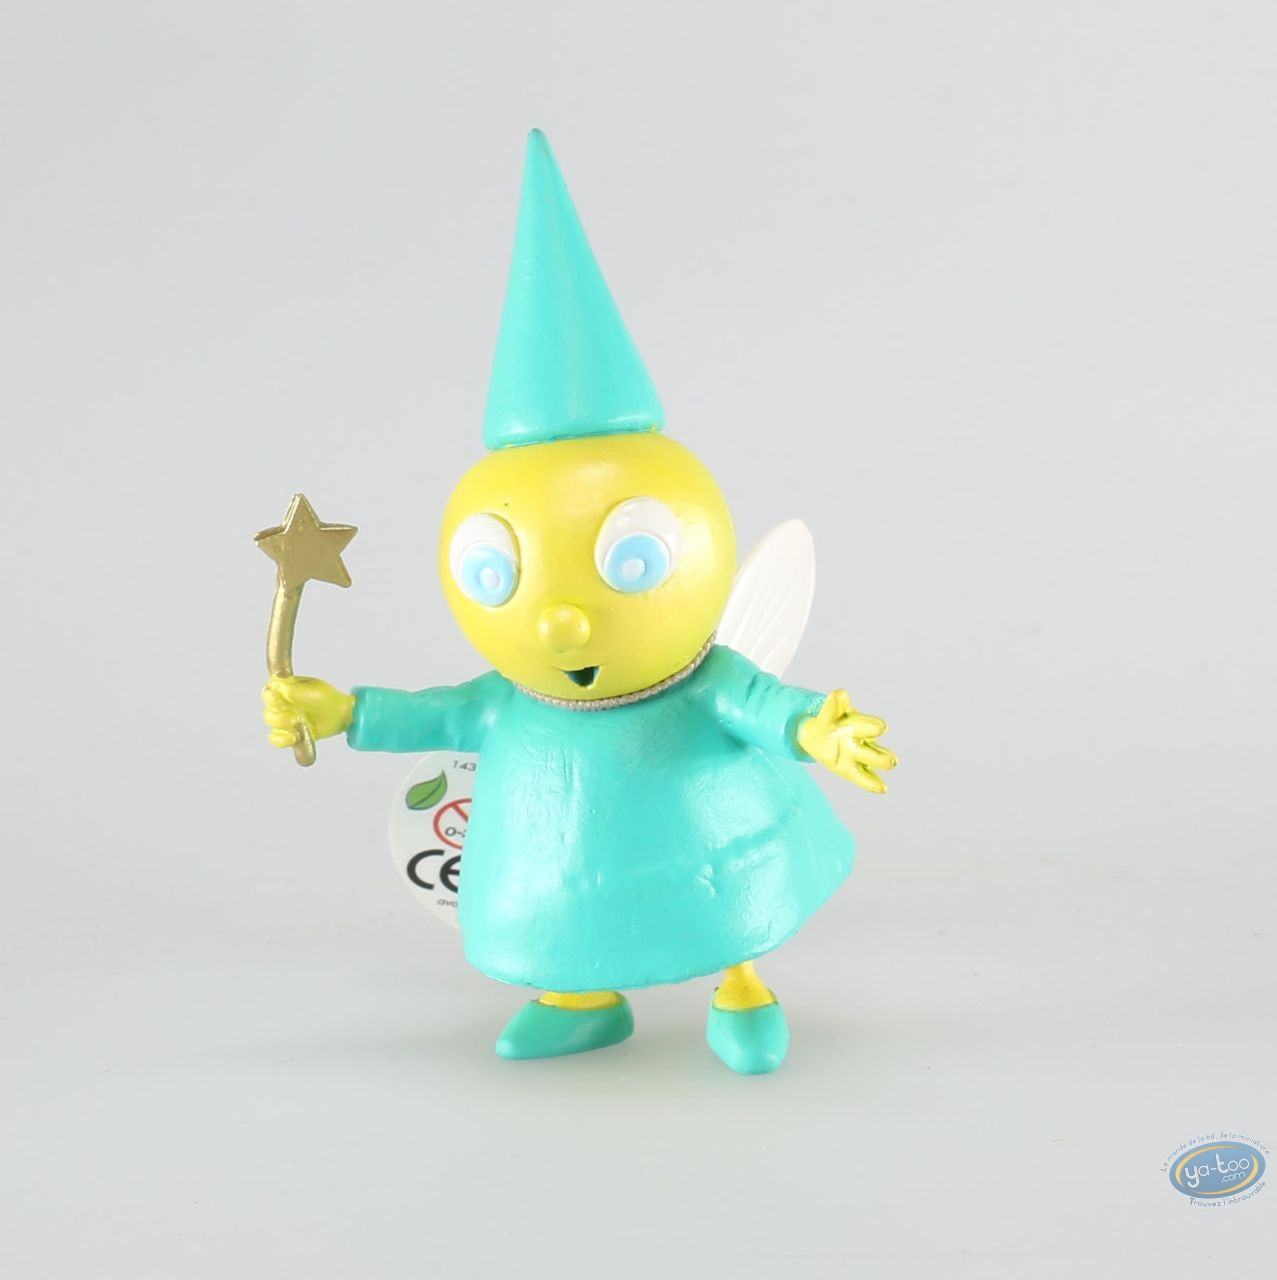 Plastic Figurine, Drôles de Petites Bêtes : Carole la luciole